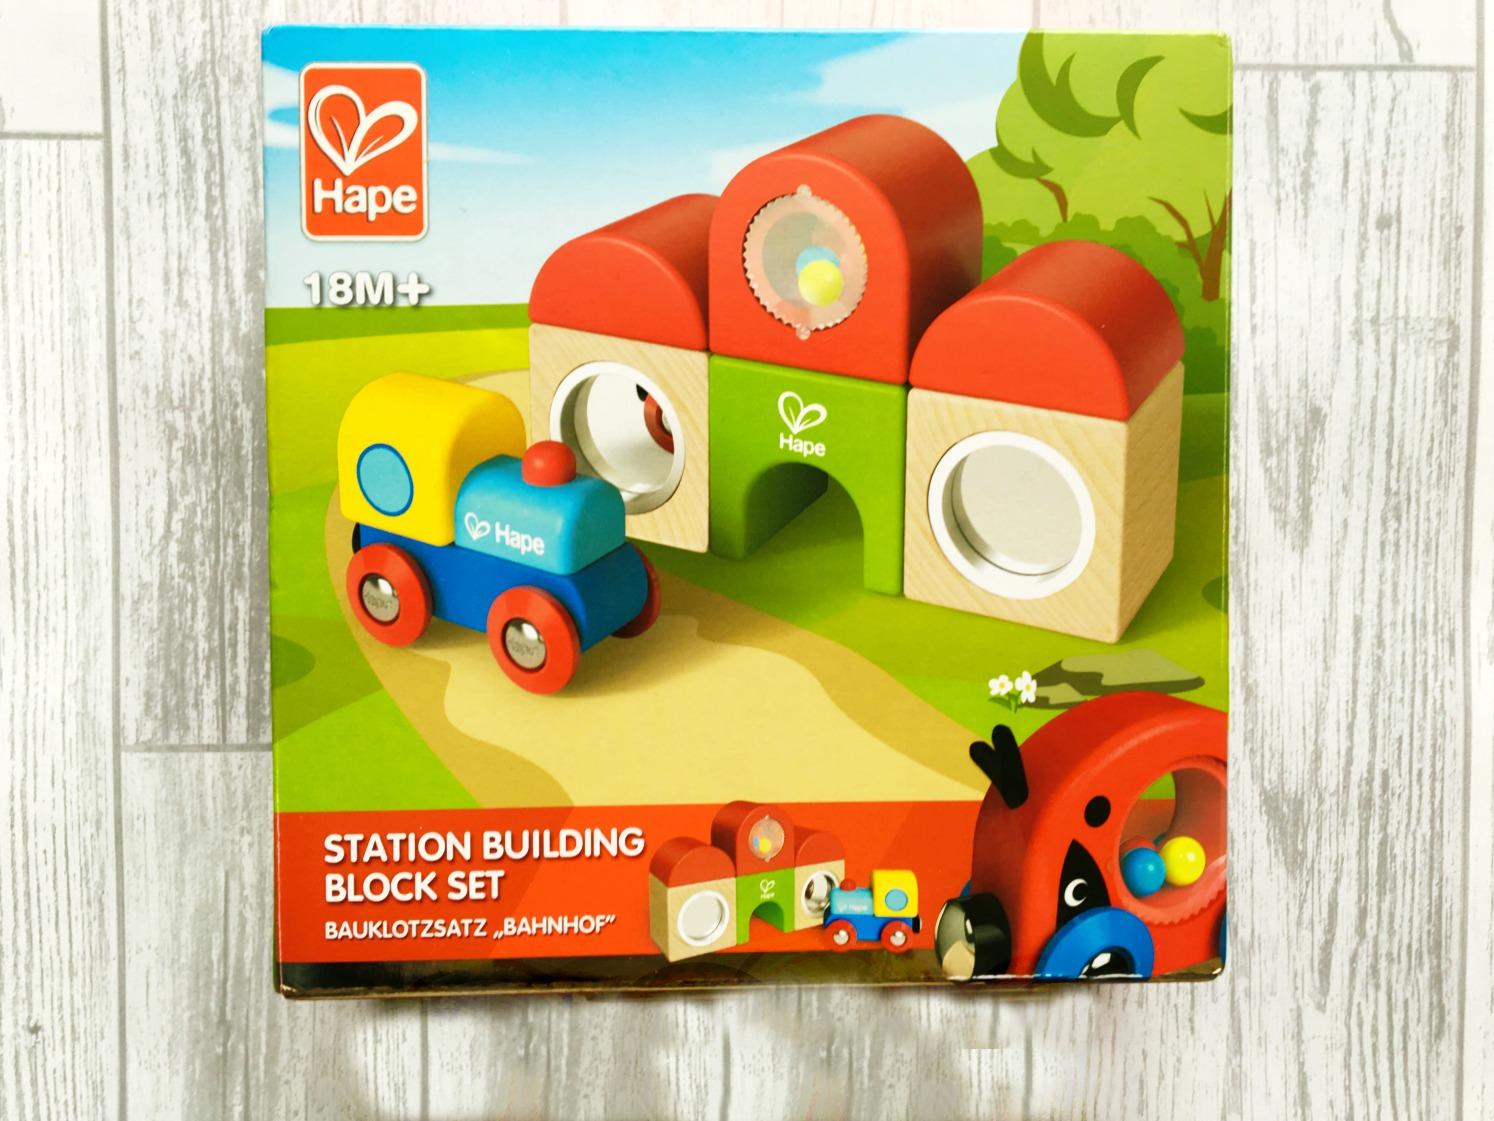 Hape Station Building Block set